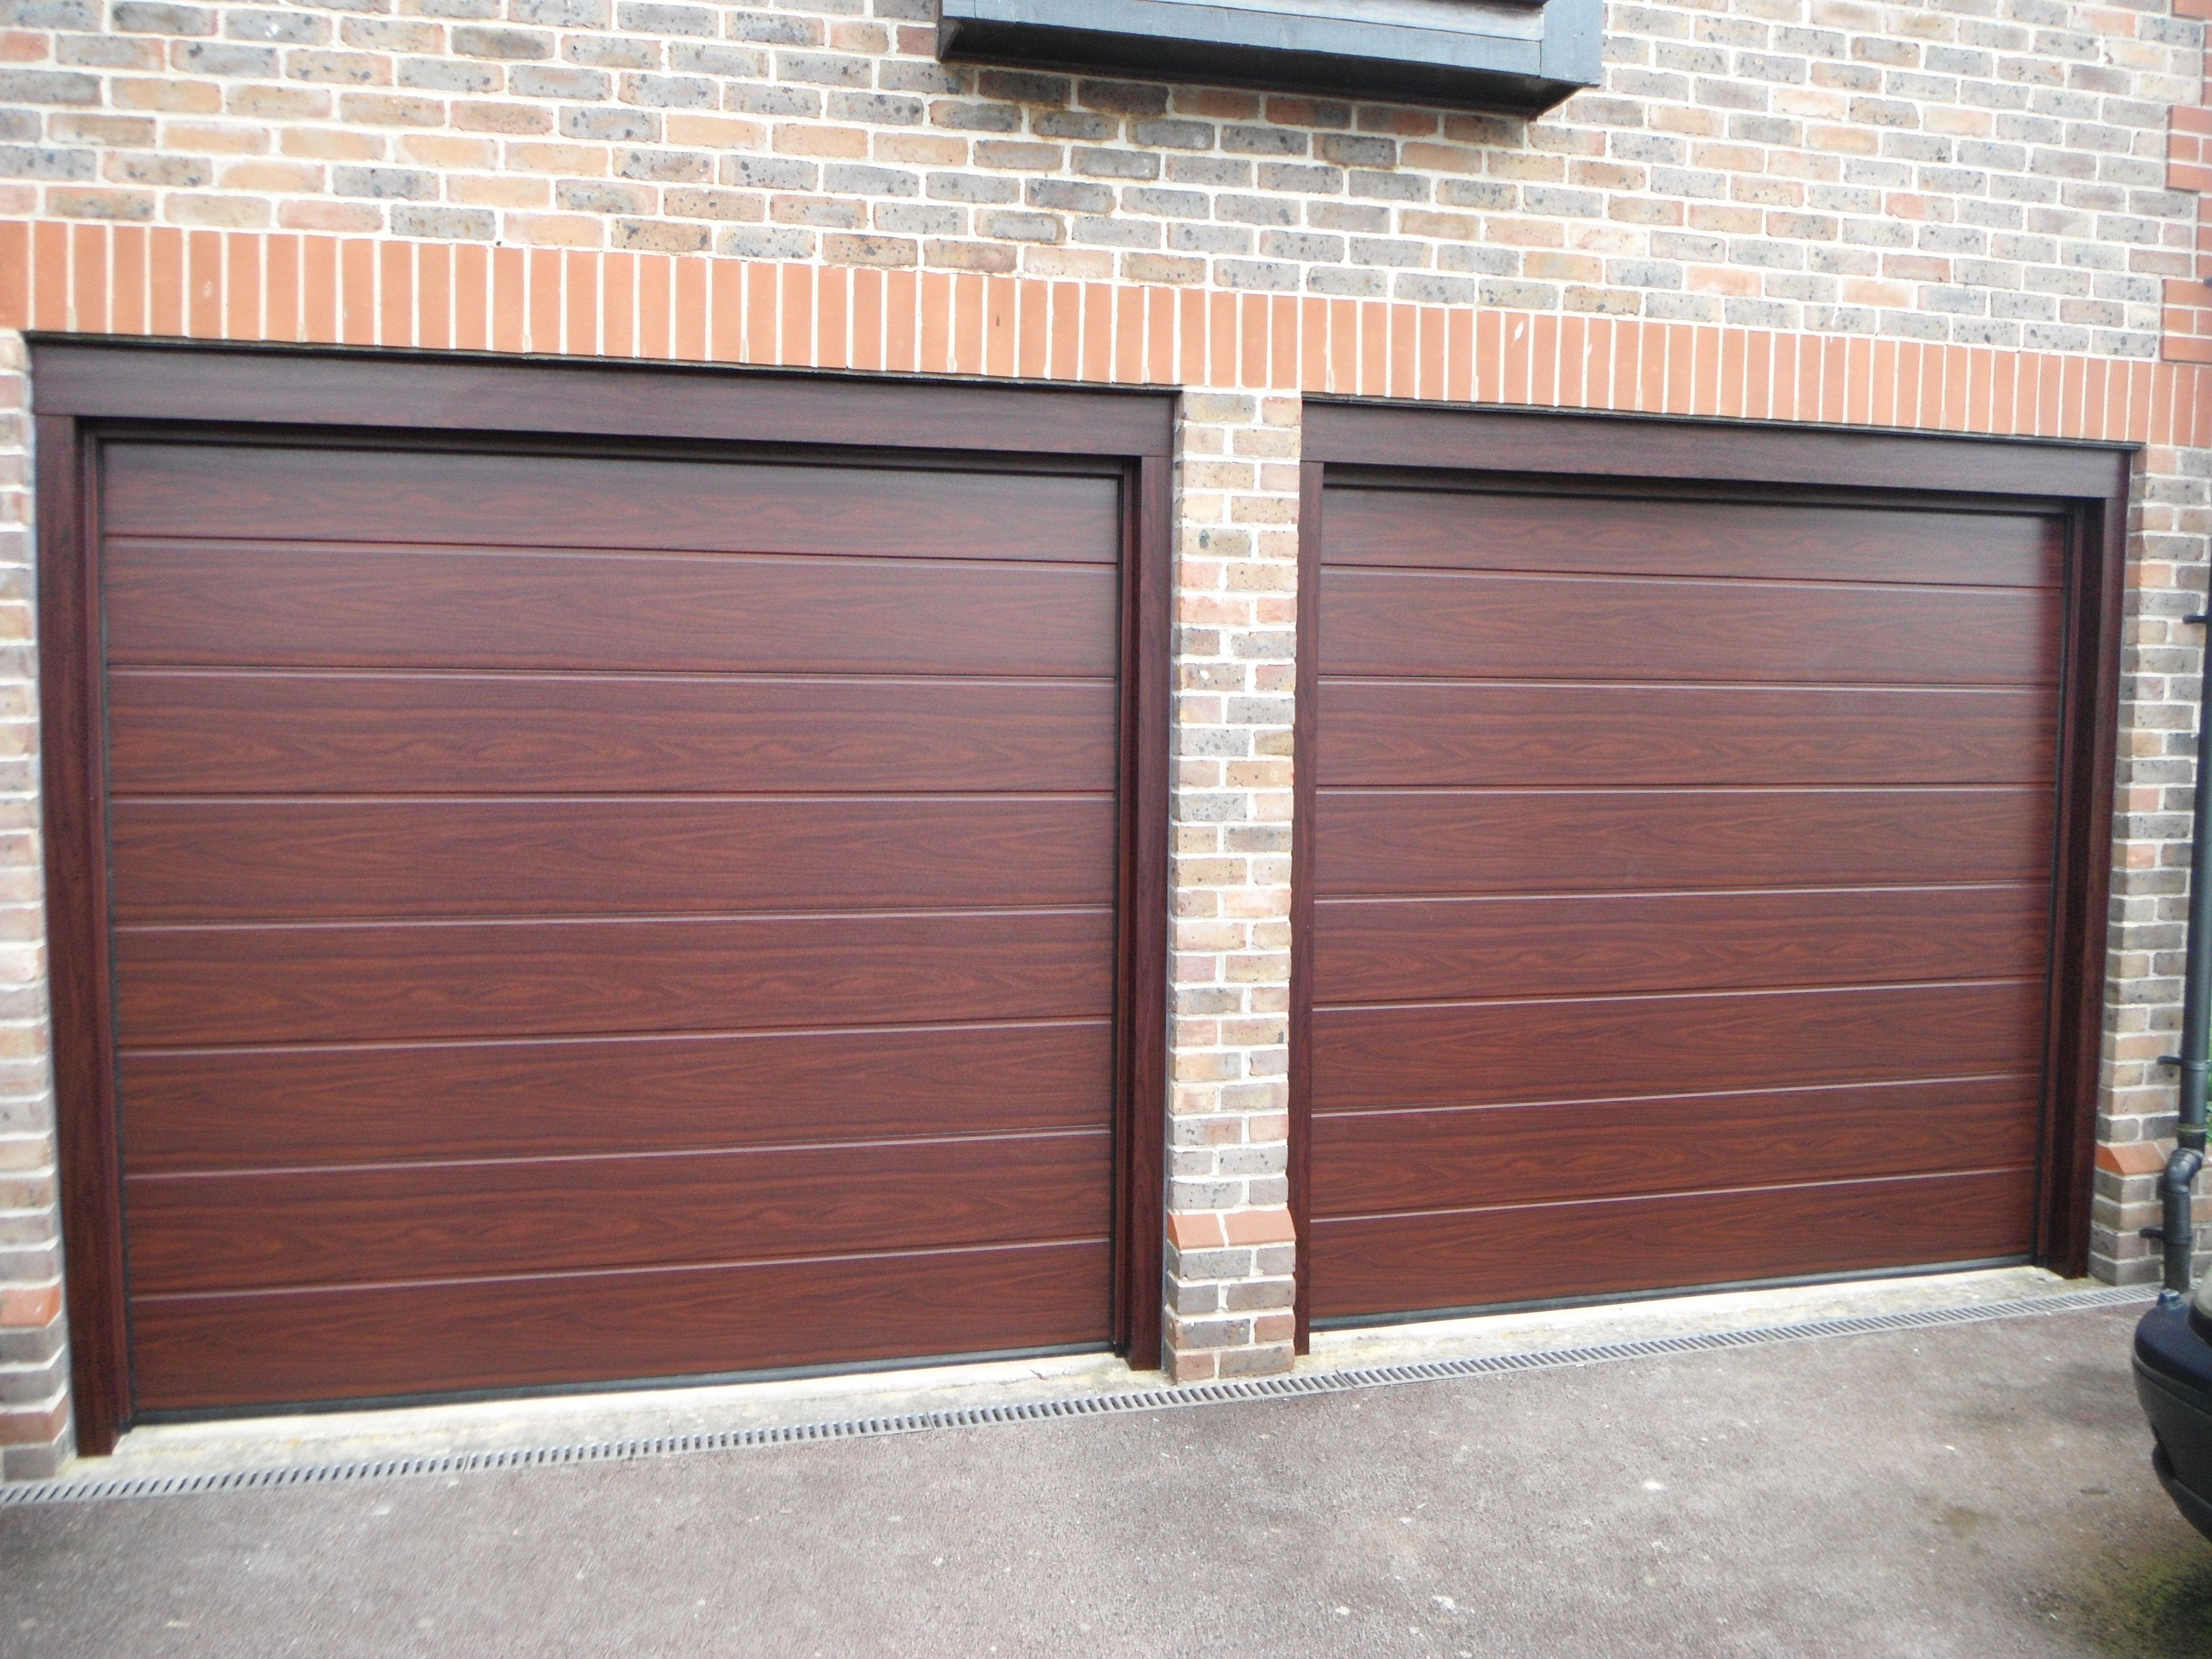 Hormann M Ribbed Decograin Rosewood Sectional Garage Doors Swr